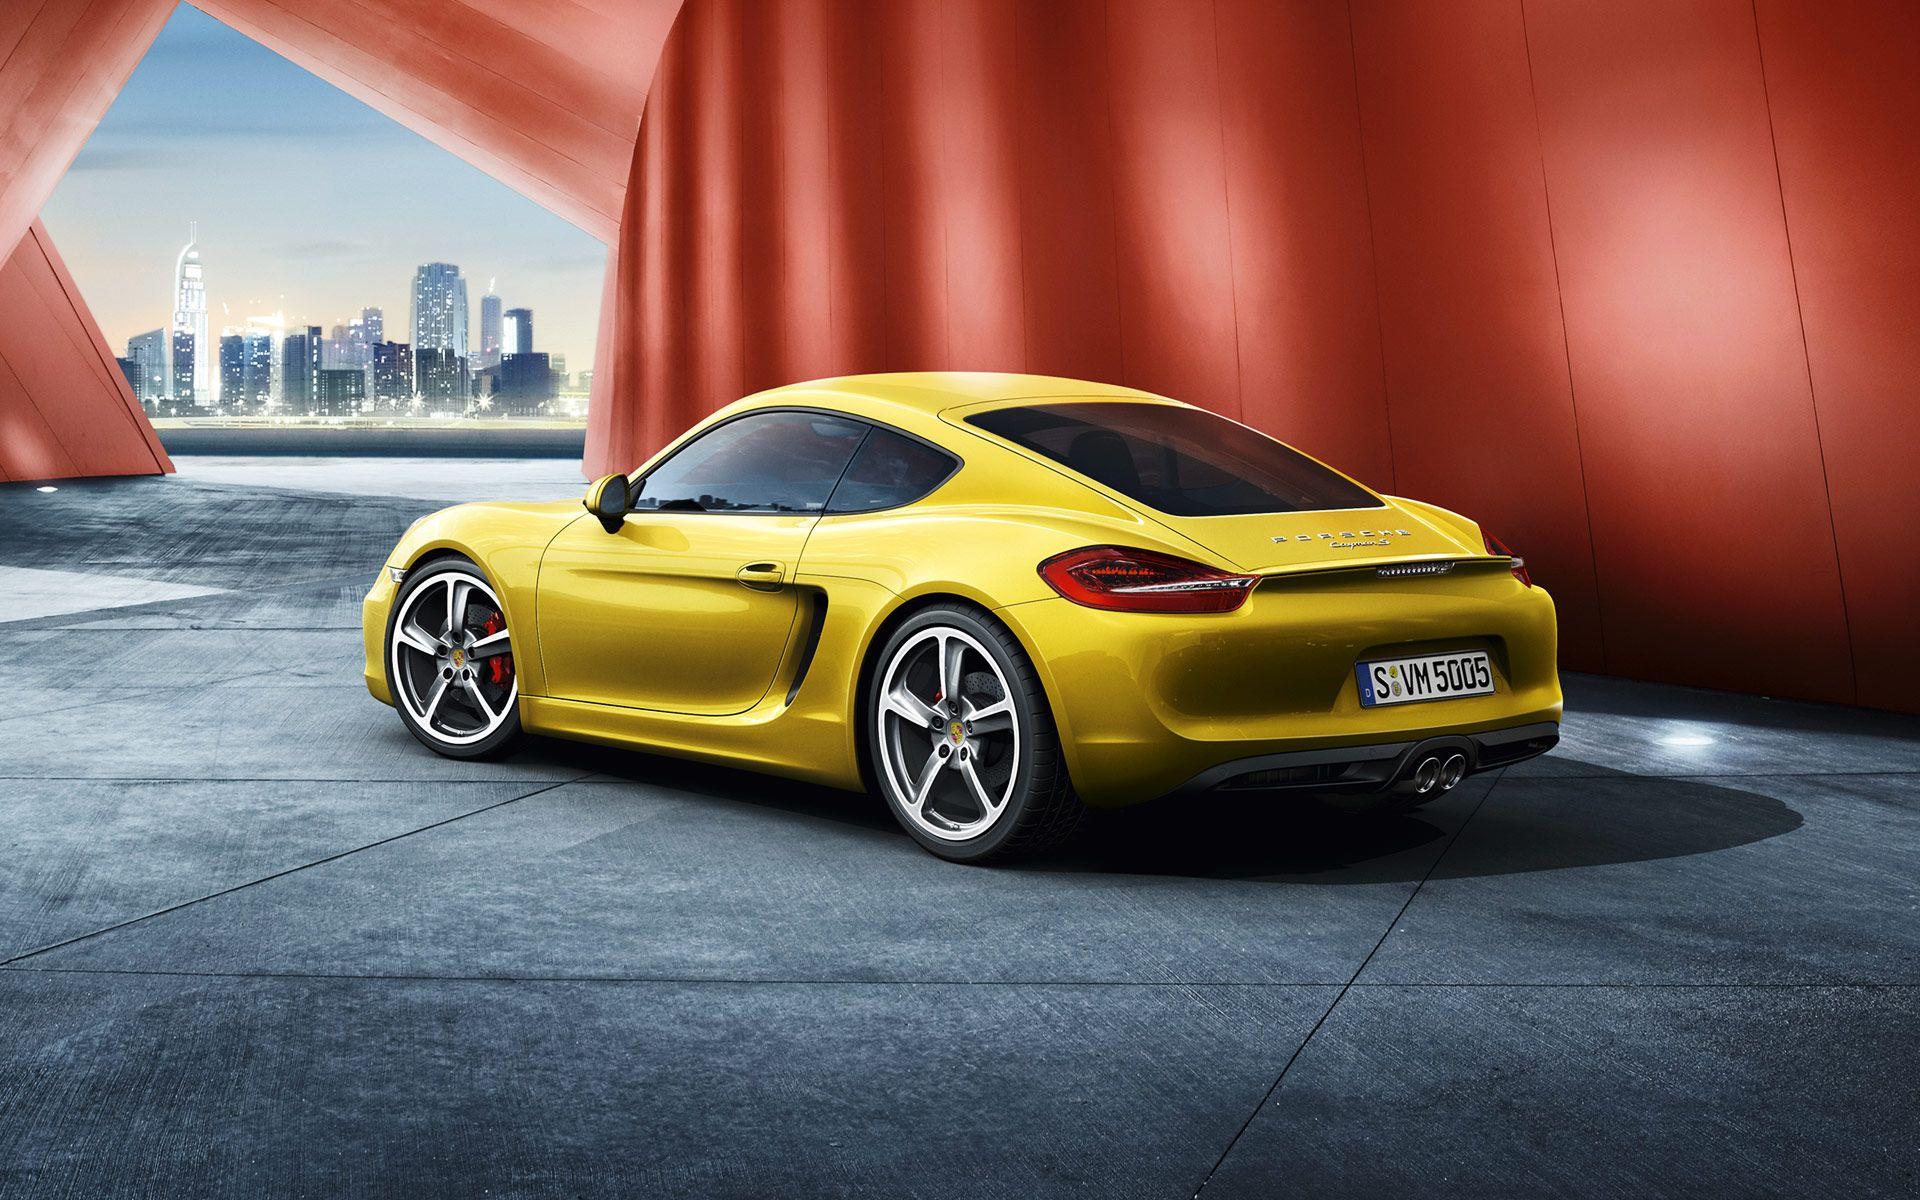 d0920290620dabfdcbcb04b487a3f673 Stunning Ficha Tecnica Porsche 918 Spyder Concept Cars Trend